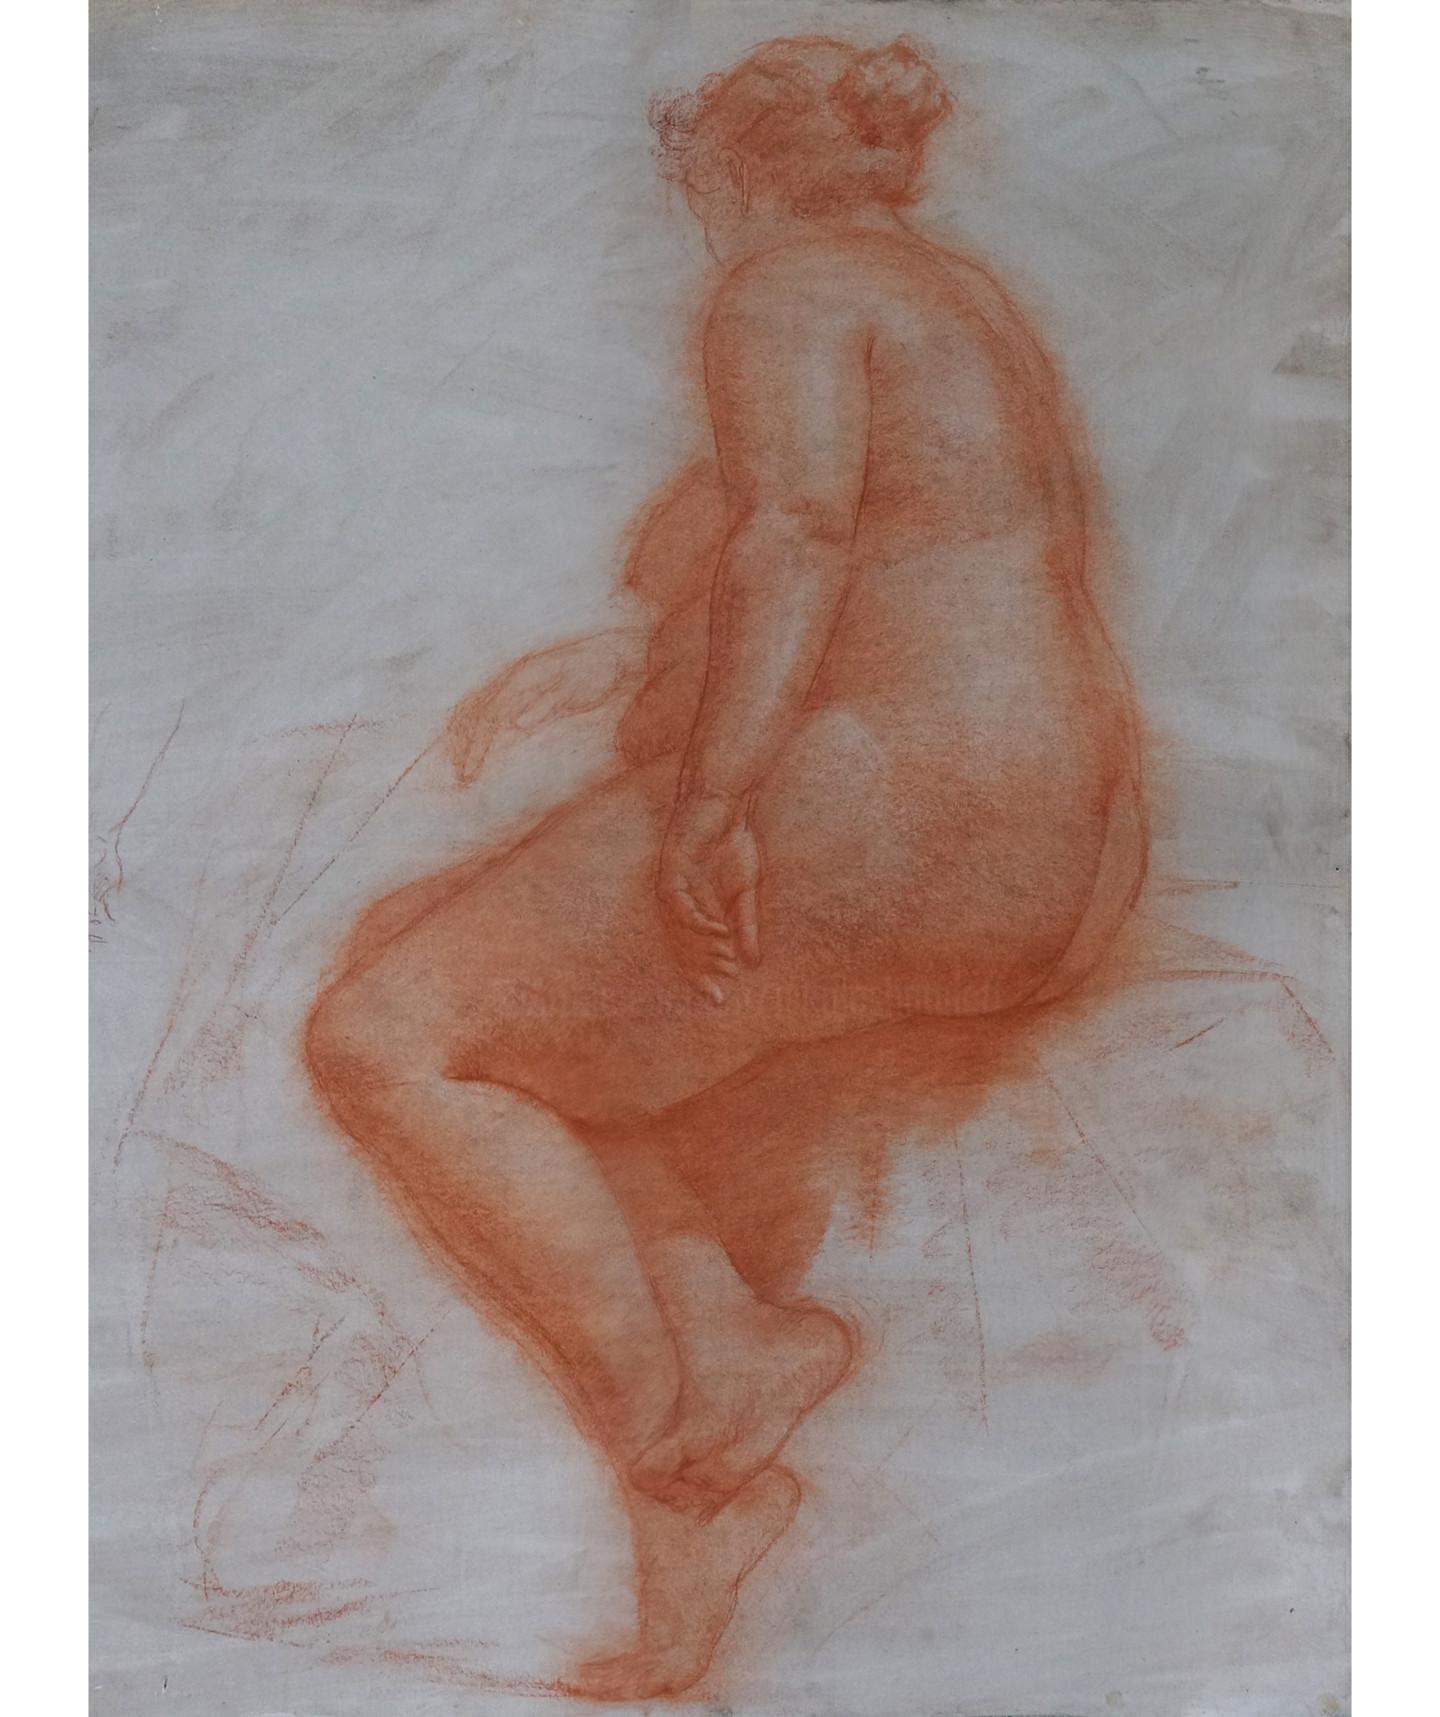 Николай Шаталов - Sitting female nude